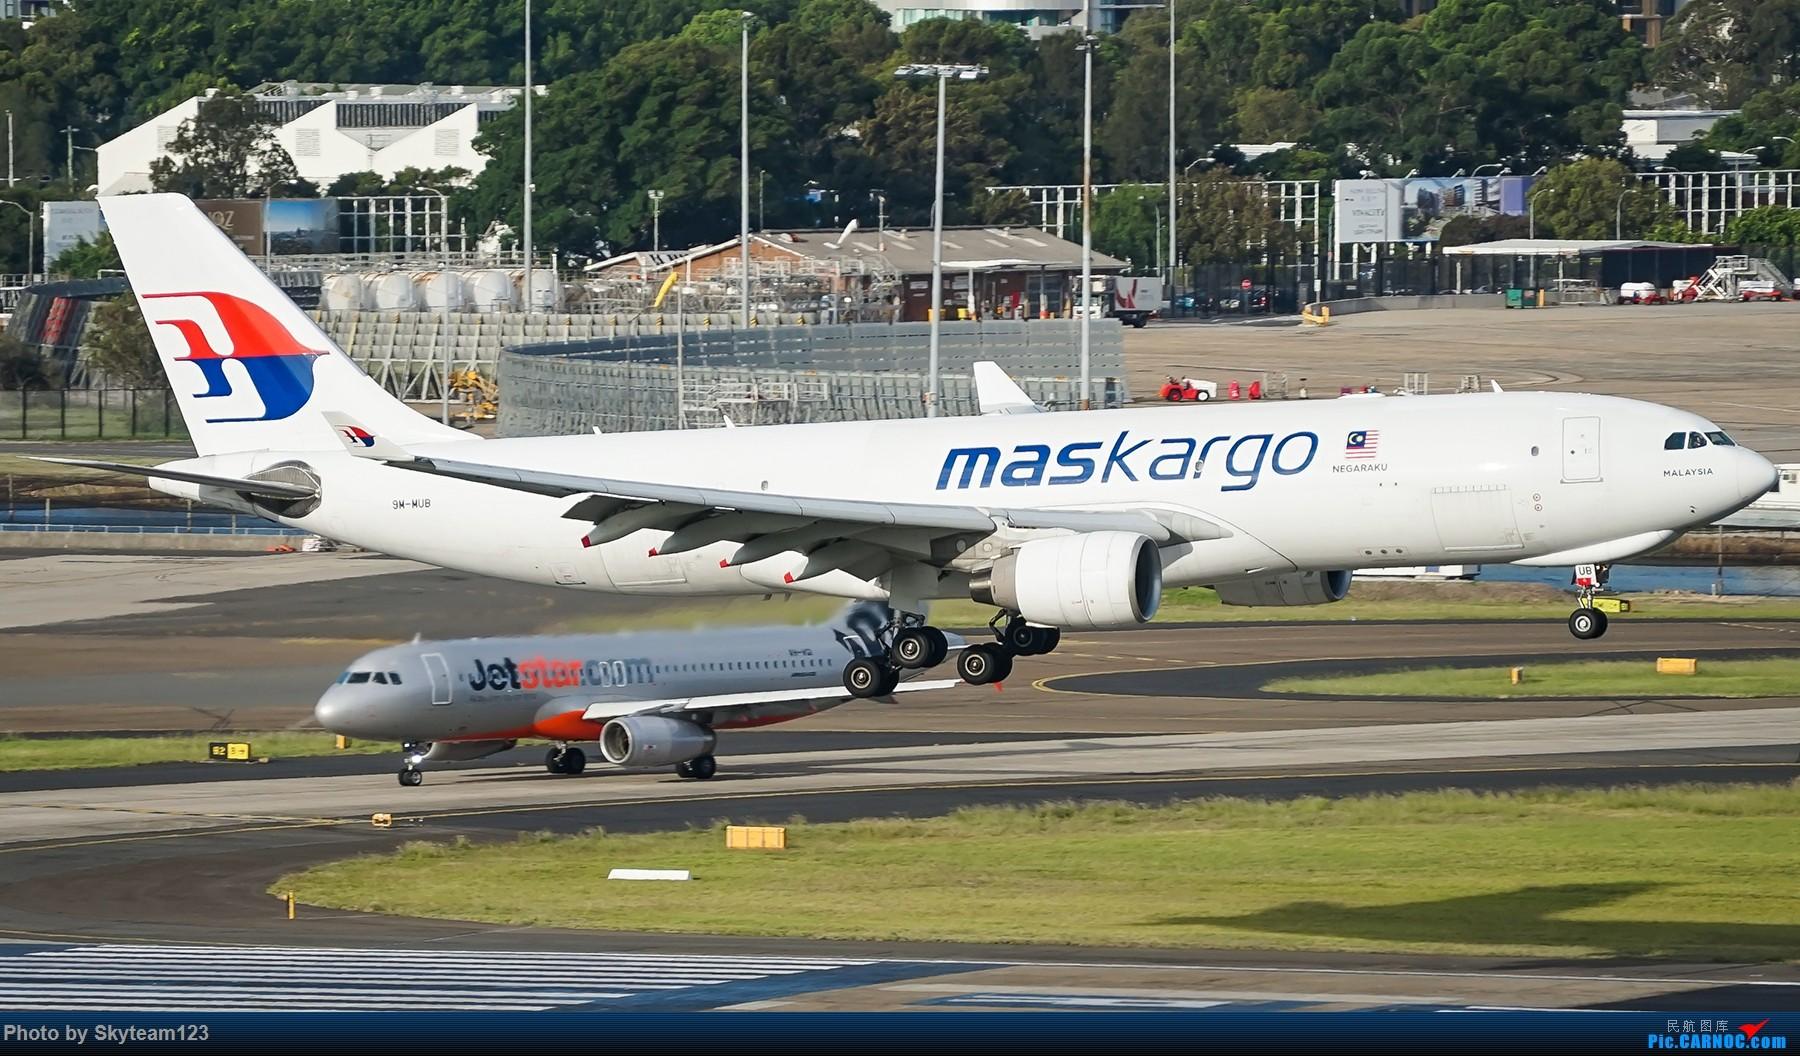 Re:[原创]【SYD】解锁T1国际航站旁停车场顶楼拍机位 下午16R抵达的好货们以及夜拍轨迹 AIRBUS A330-200F 9M-MUB